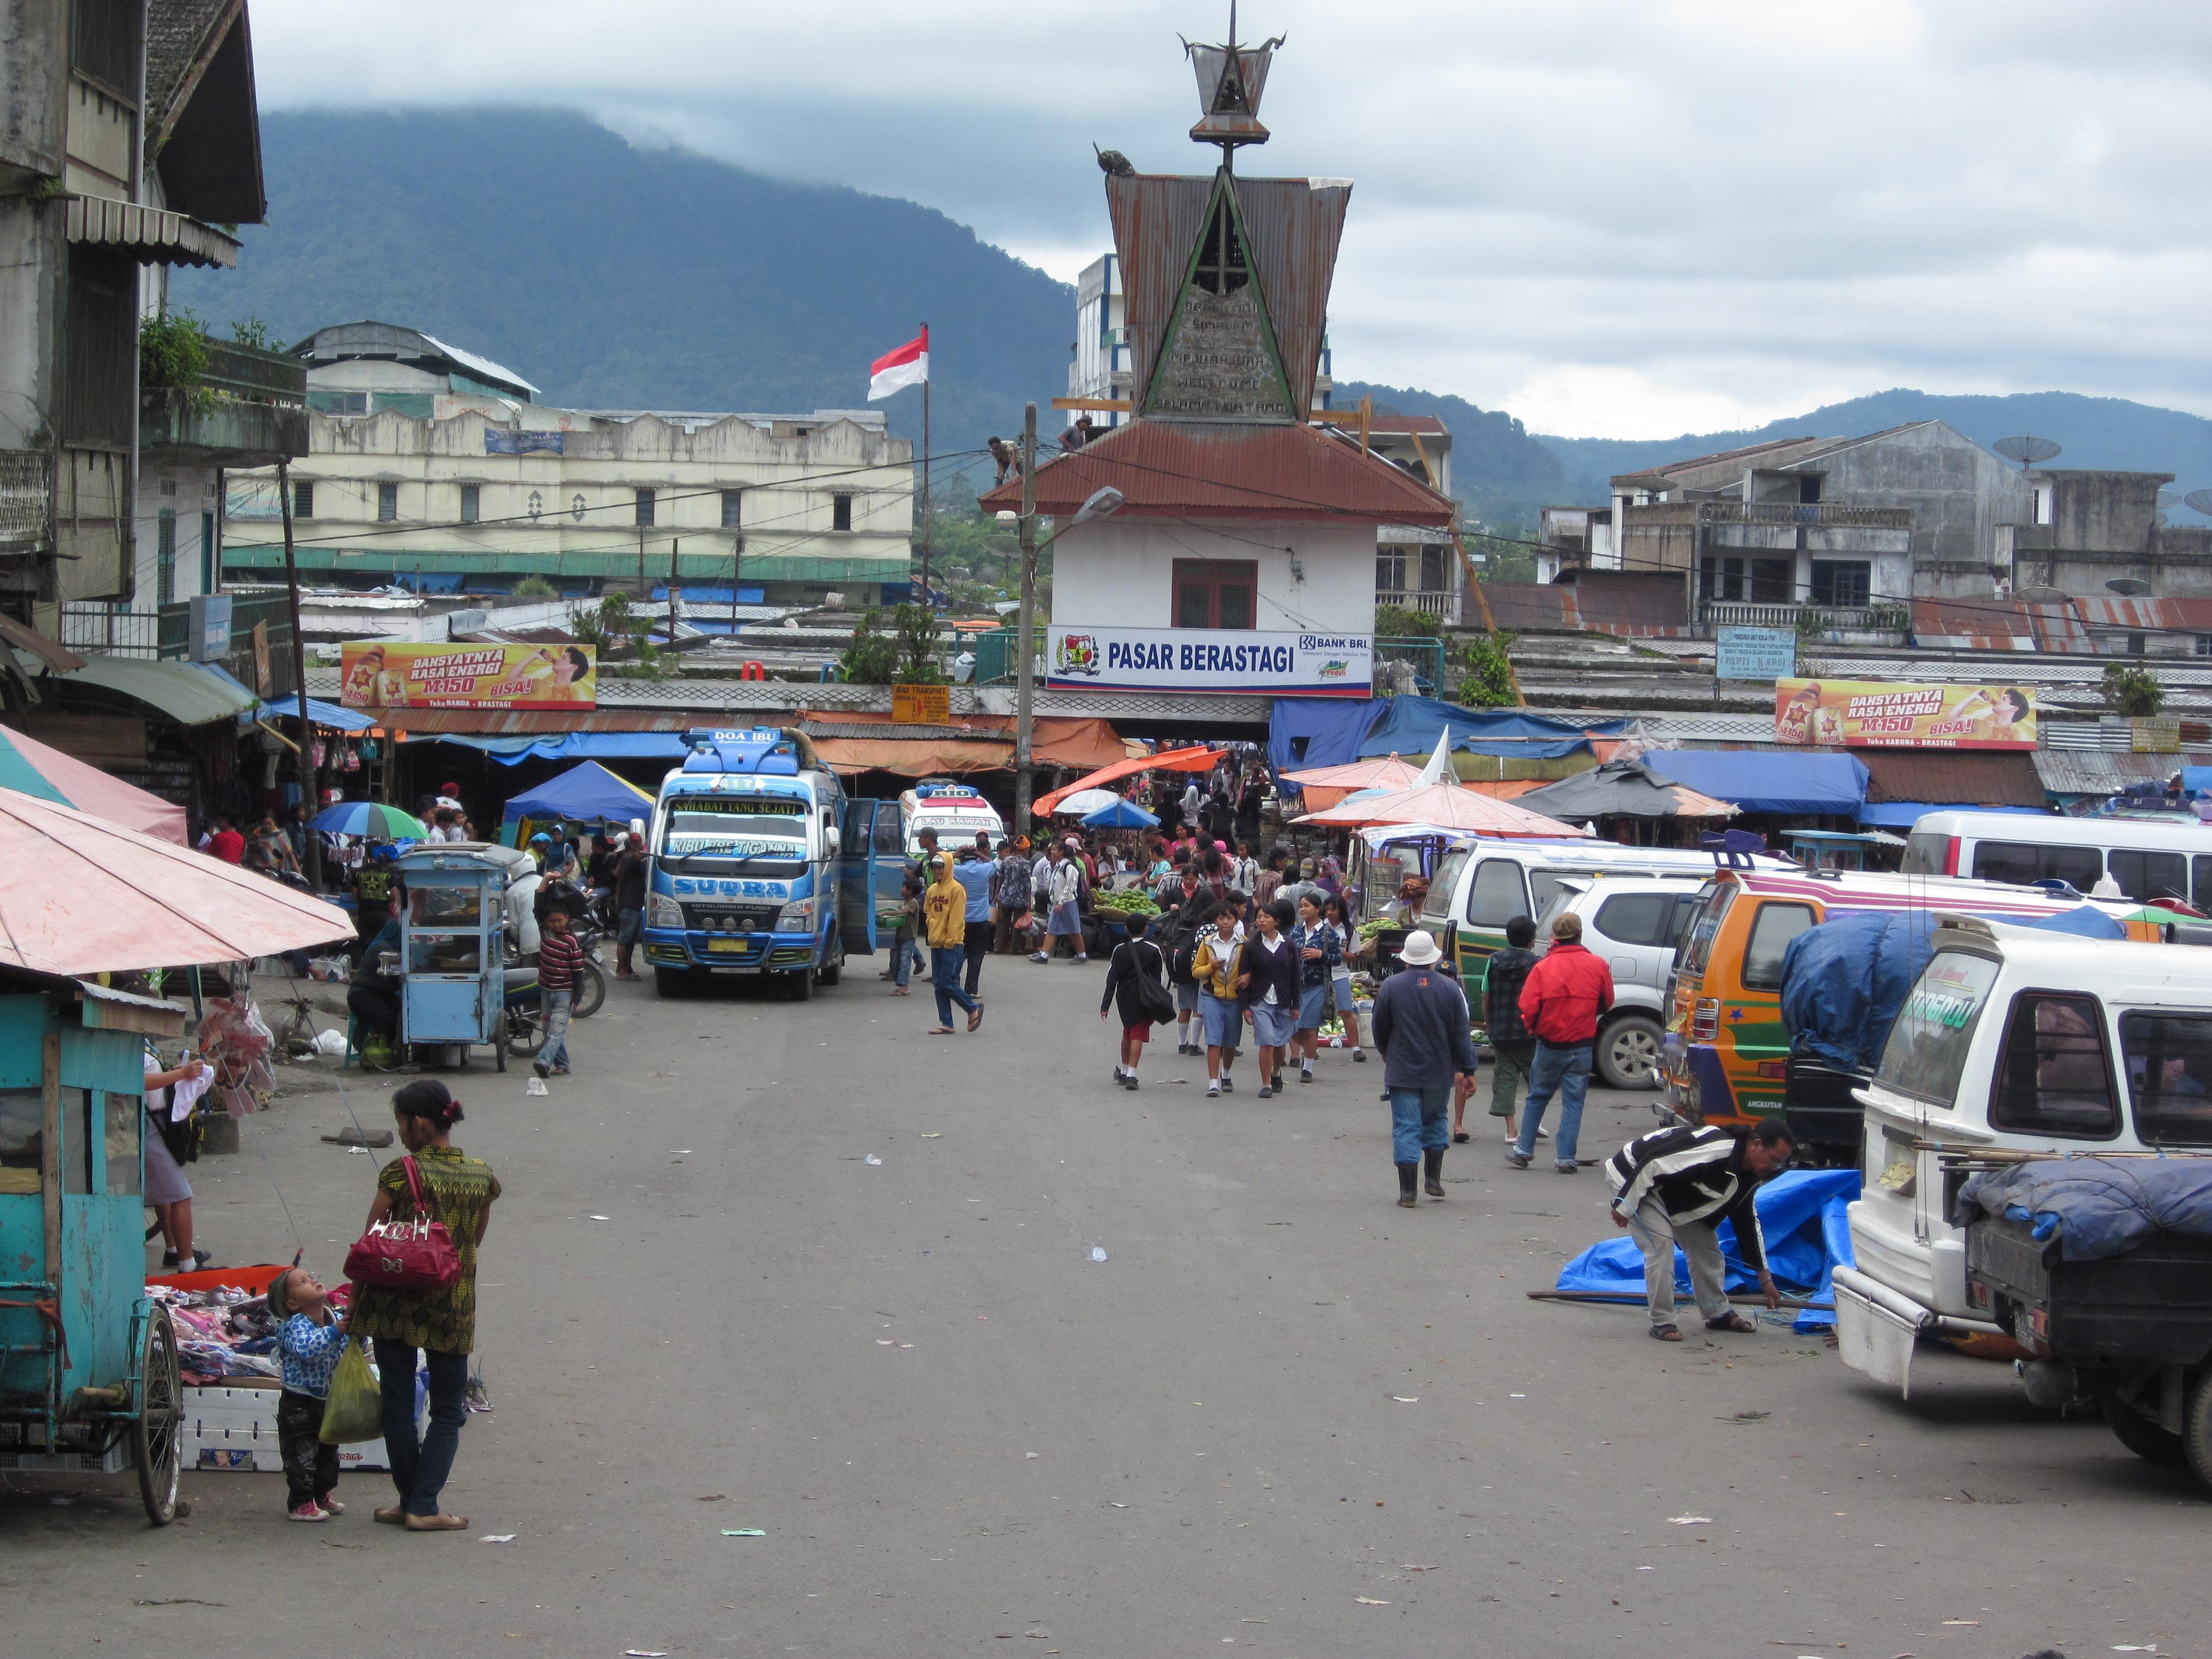 Berastagi Indonesia  city photos gallery : Description Pasar Berastagi